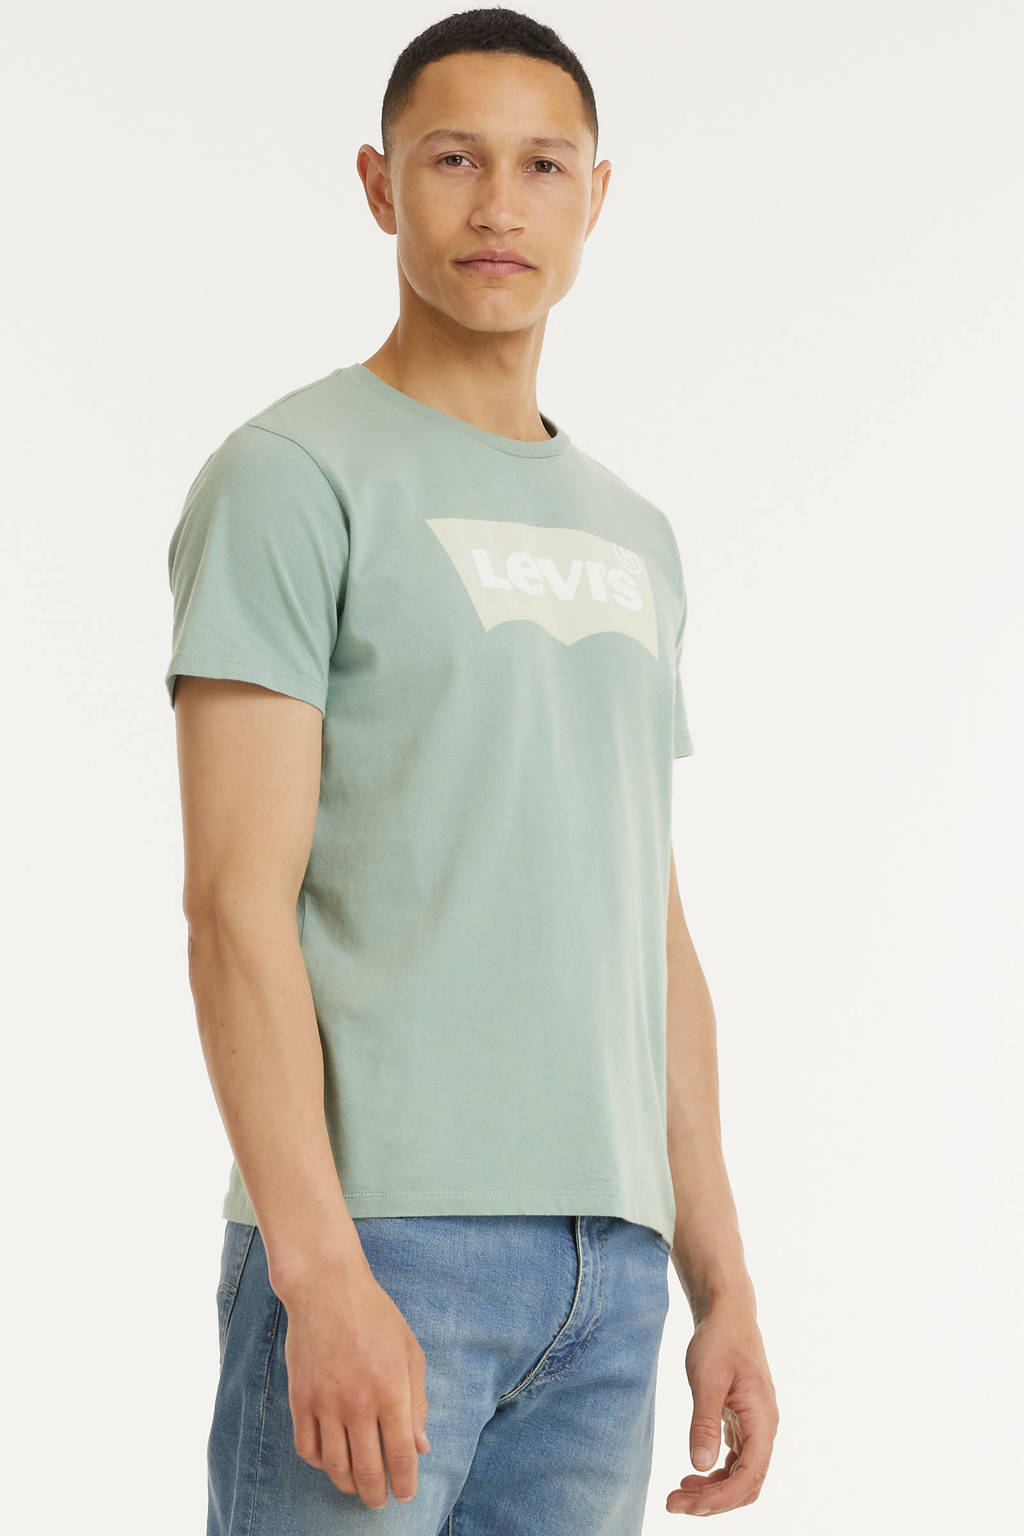 Levi's T-shirt HOUSEMARK GRAPHIC met logo chest batwing blue surf, Chest batwing blue surf